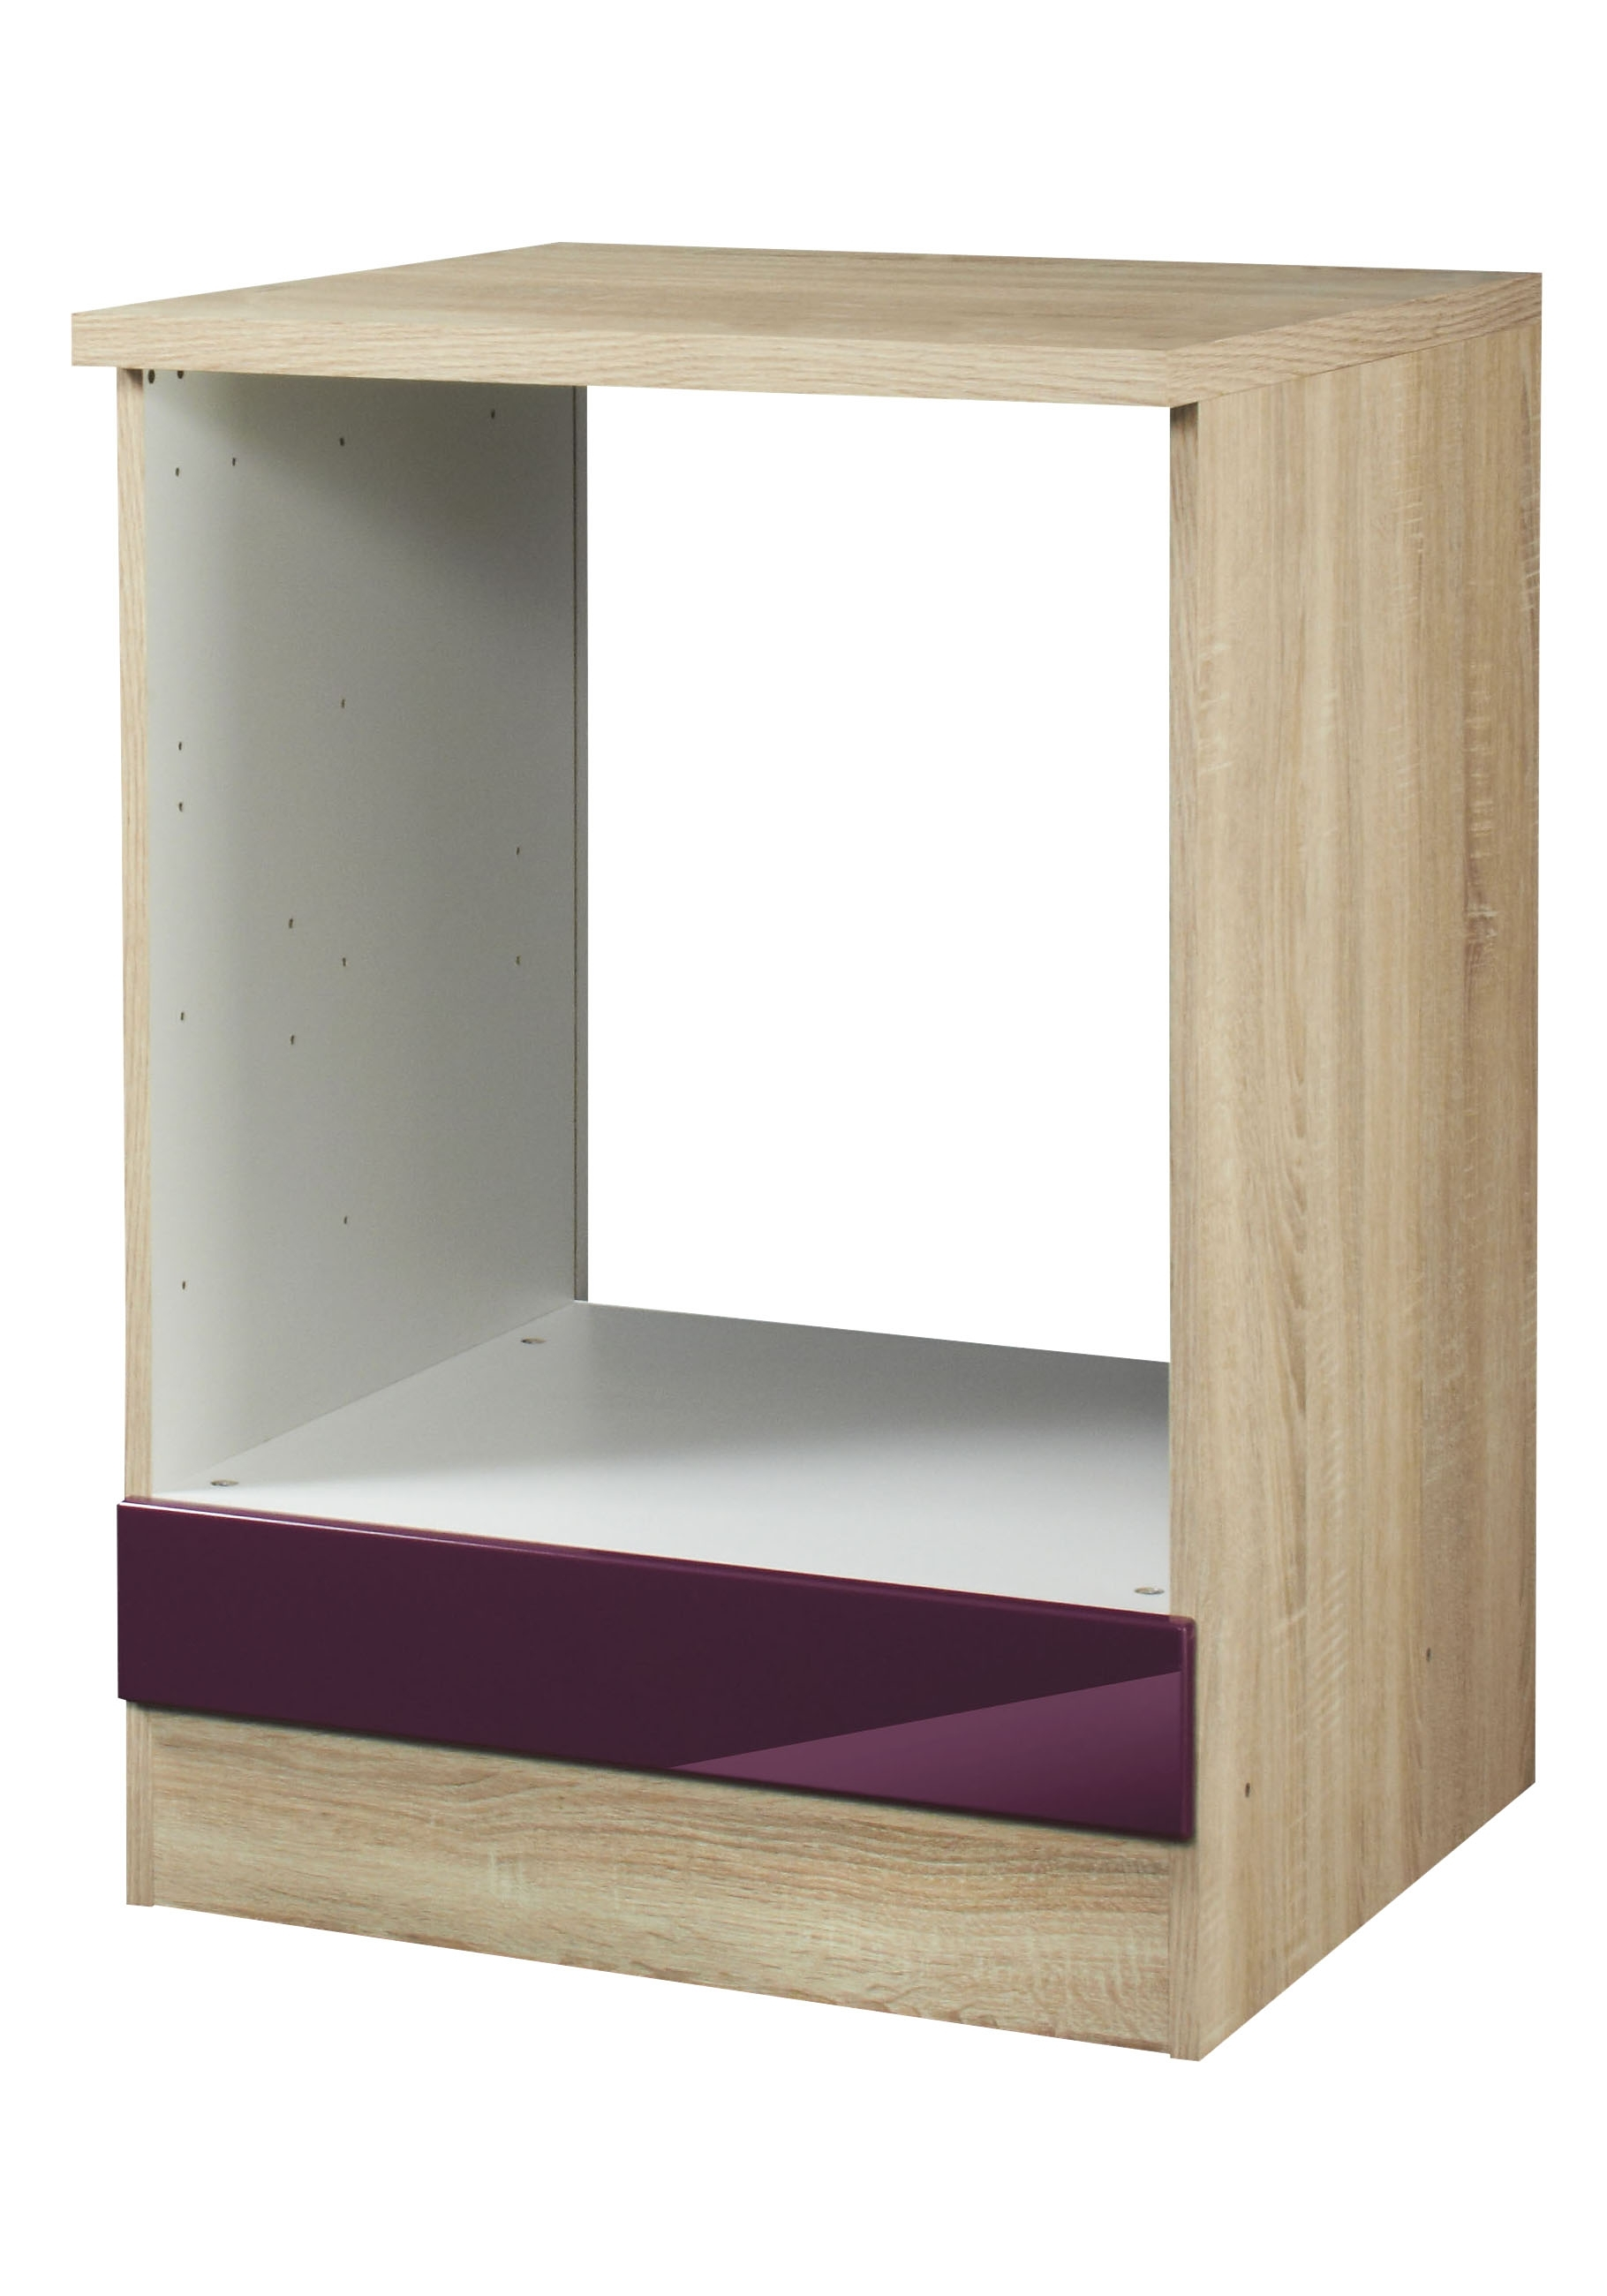 held m bel ombouwkast voor oven fulda breedte 60 cm nu. Black Bedroom Furniture Sets. Home Design Ideas